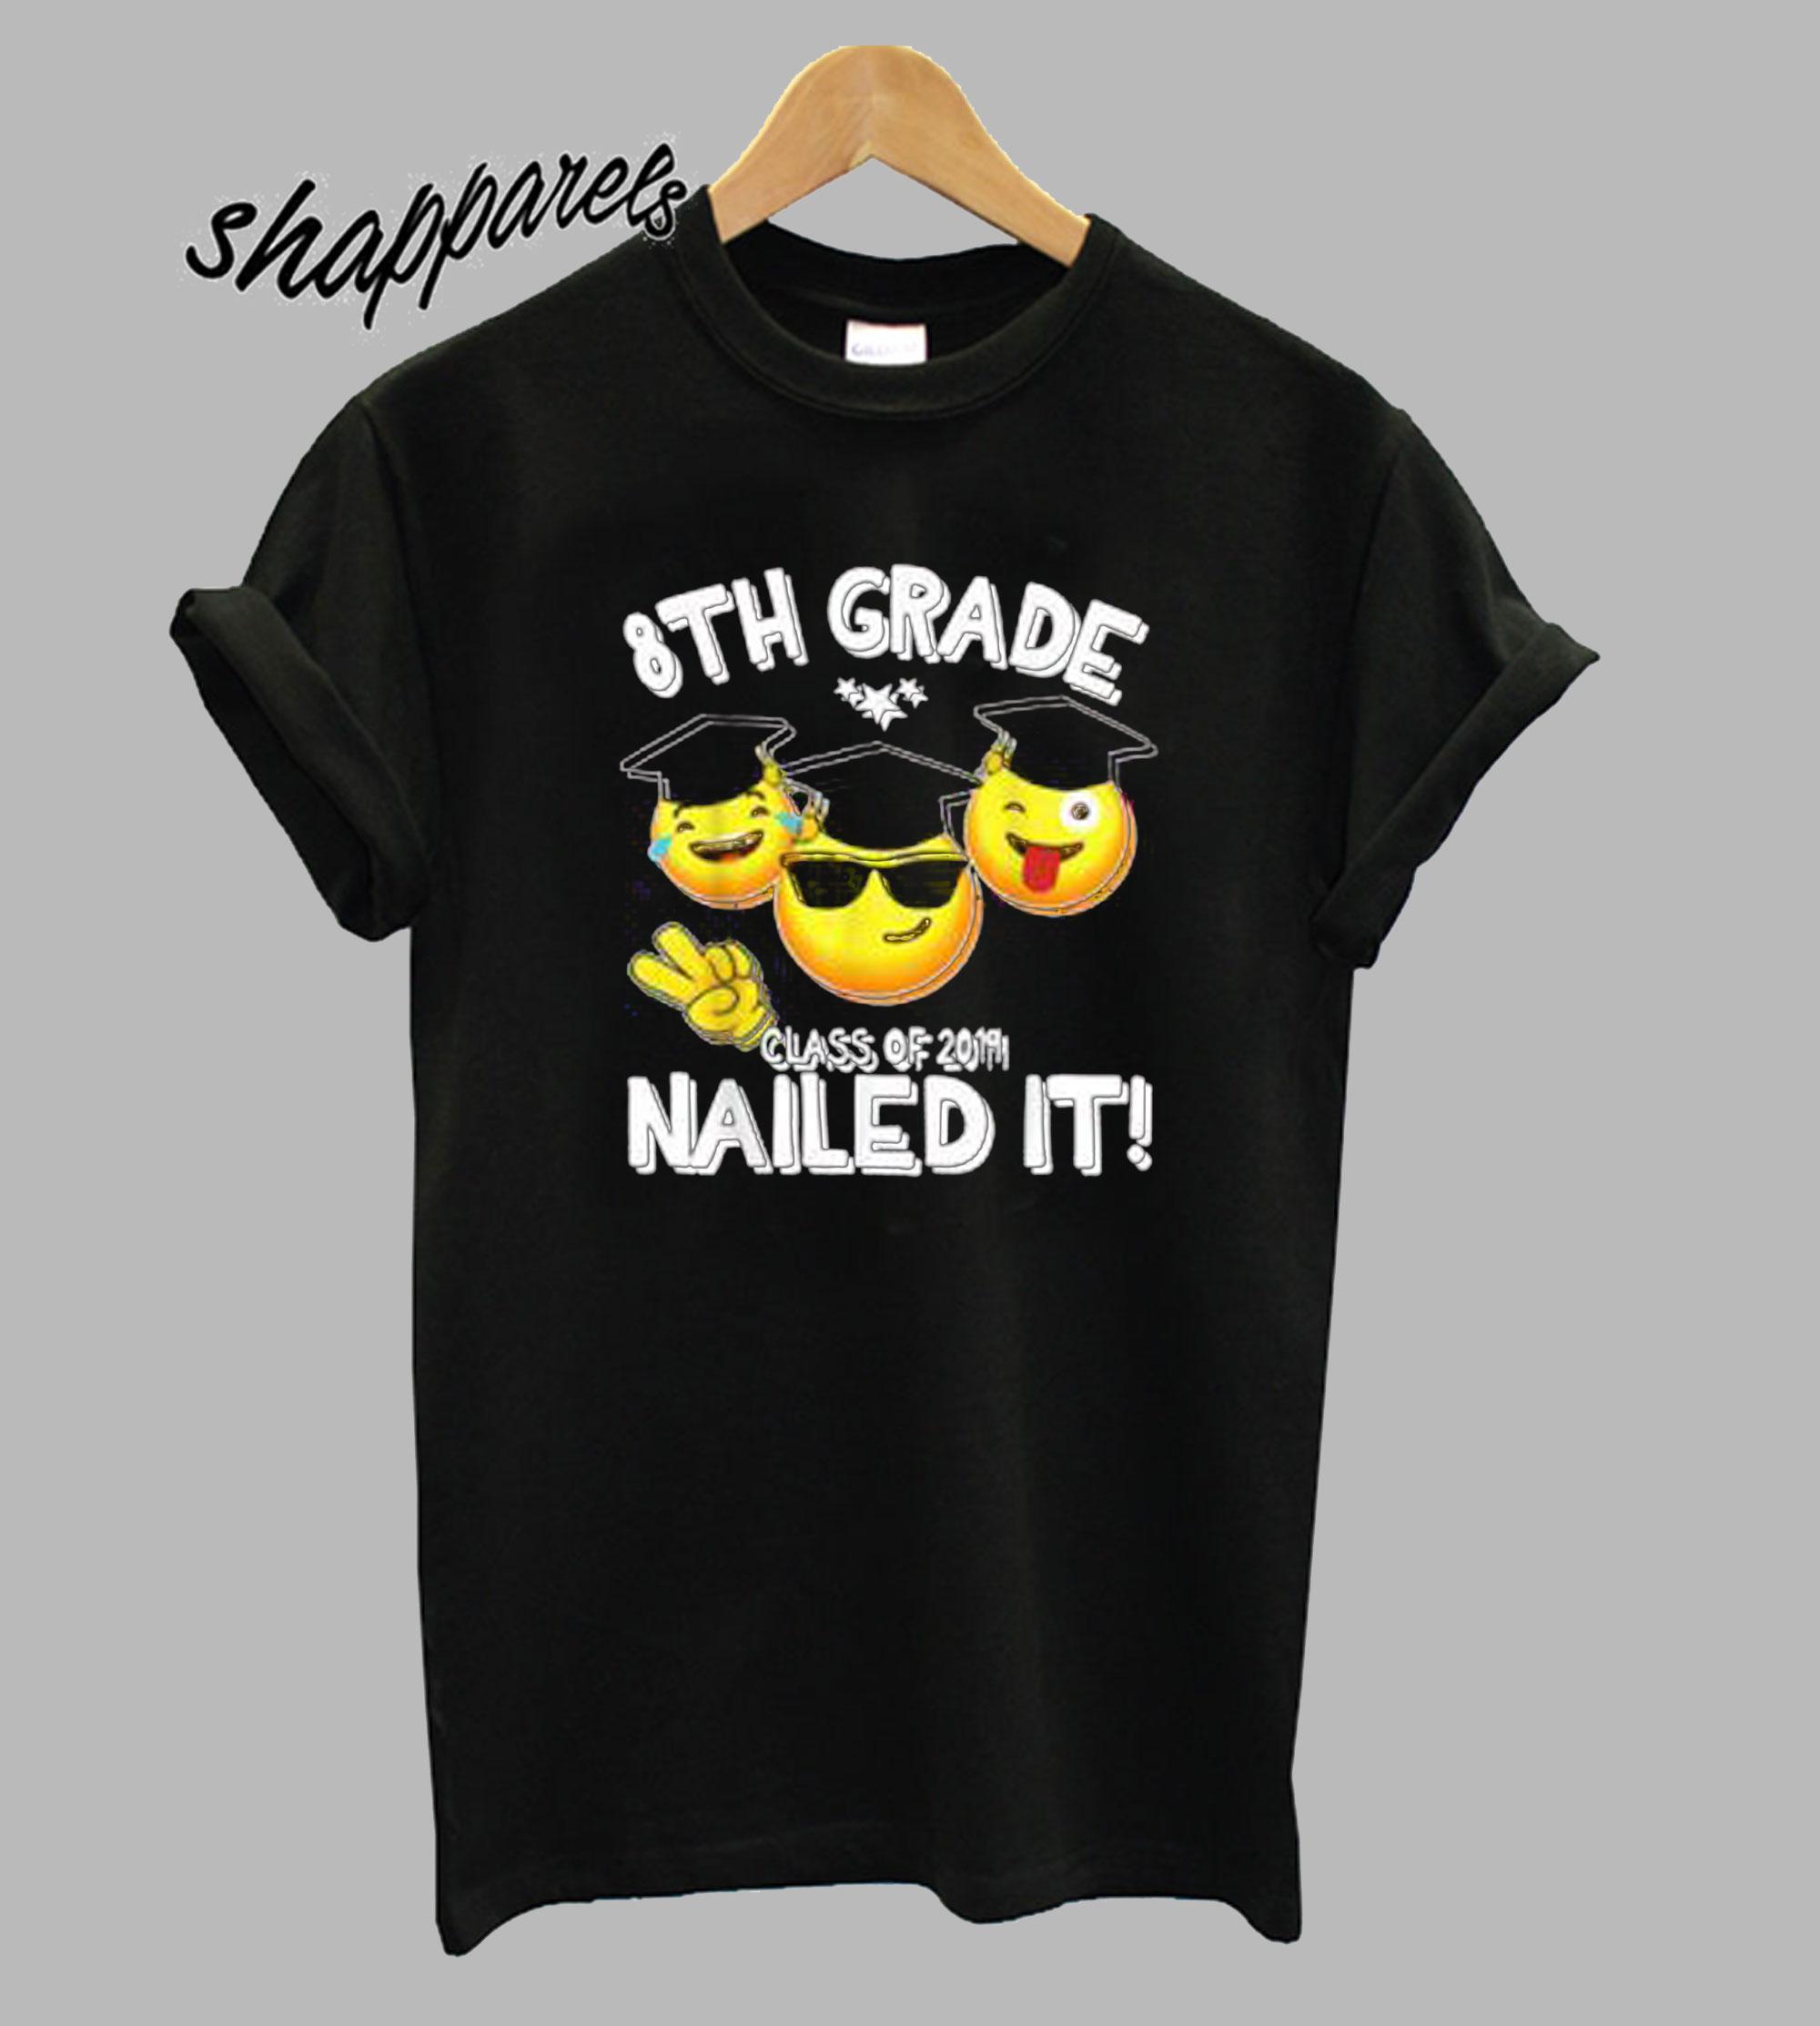 8TH Grade Class Of 2019 Nail It Love Back T Shirt